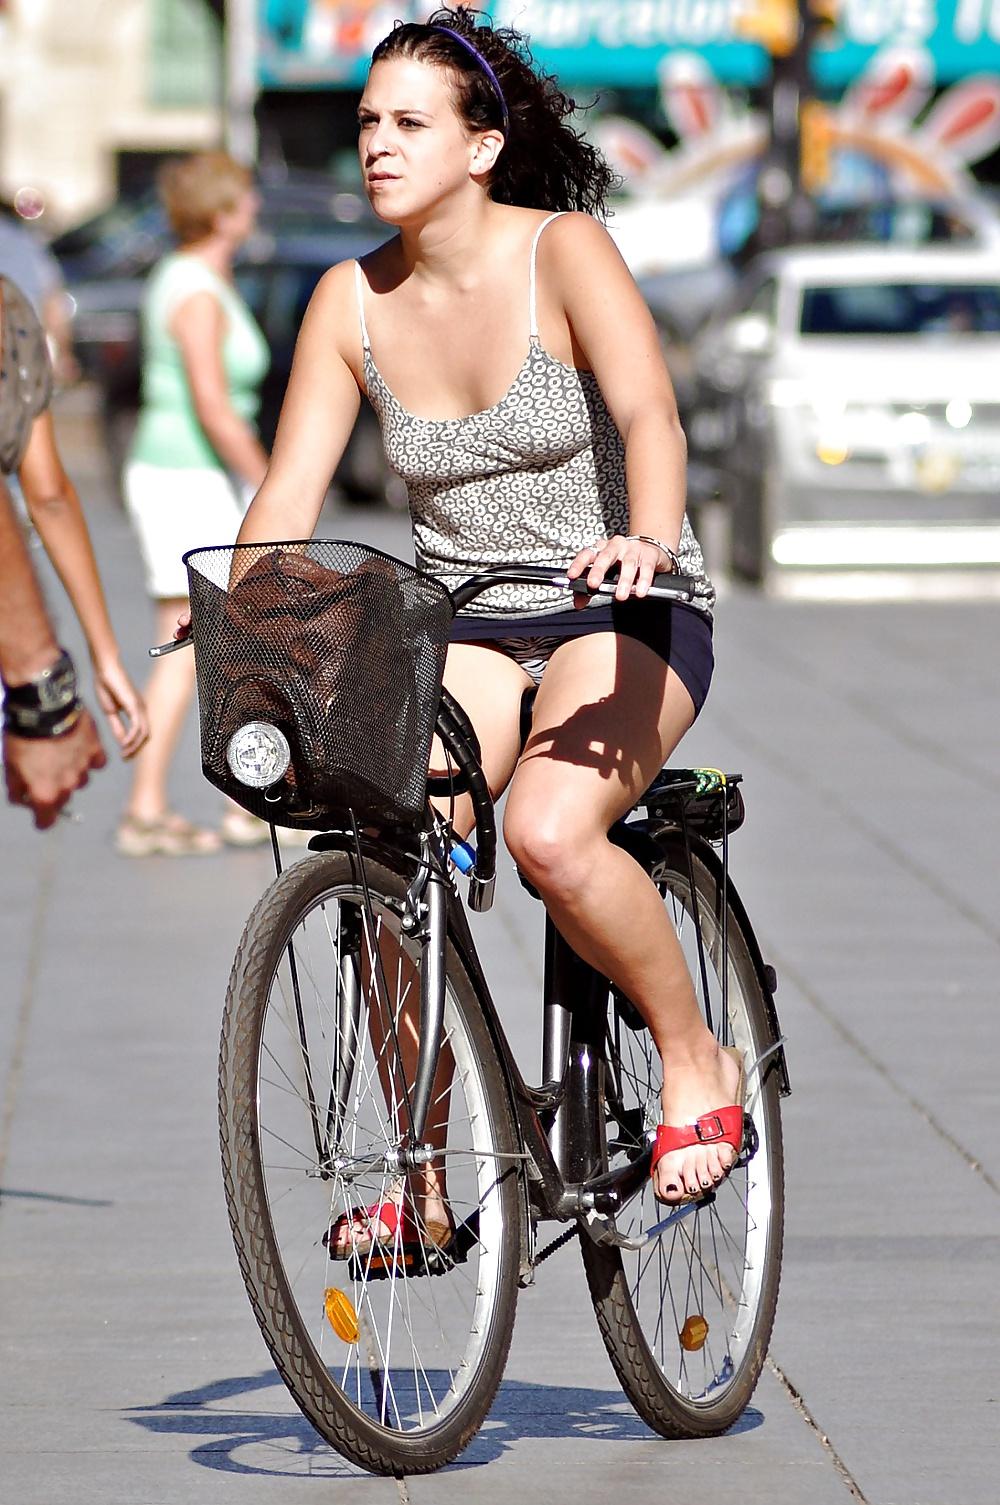 Close up outdoor posing featuring teen babe zuzana g on a bike